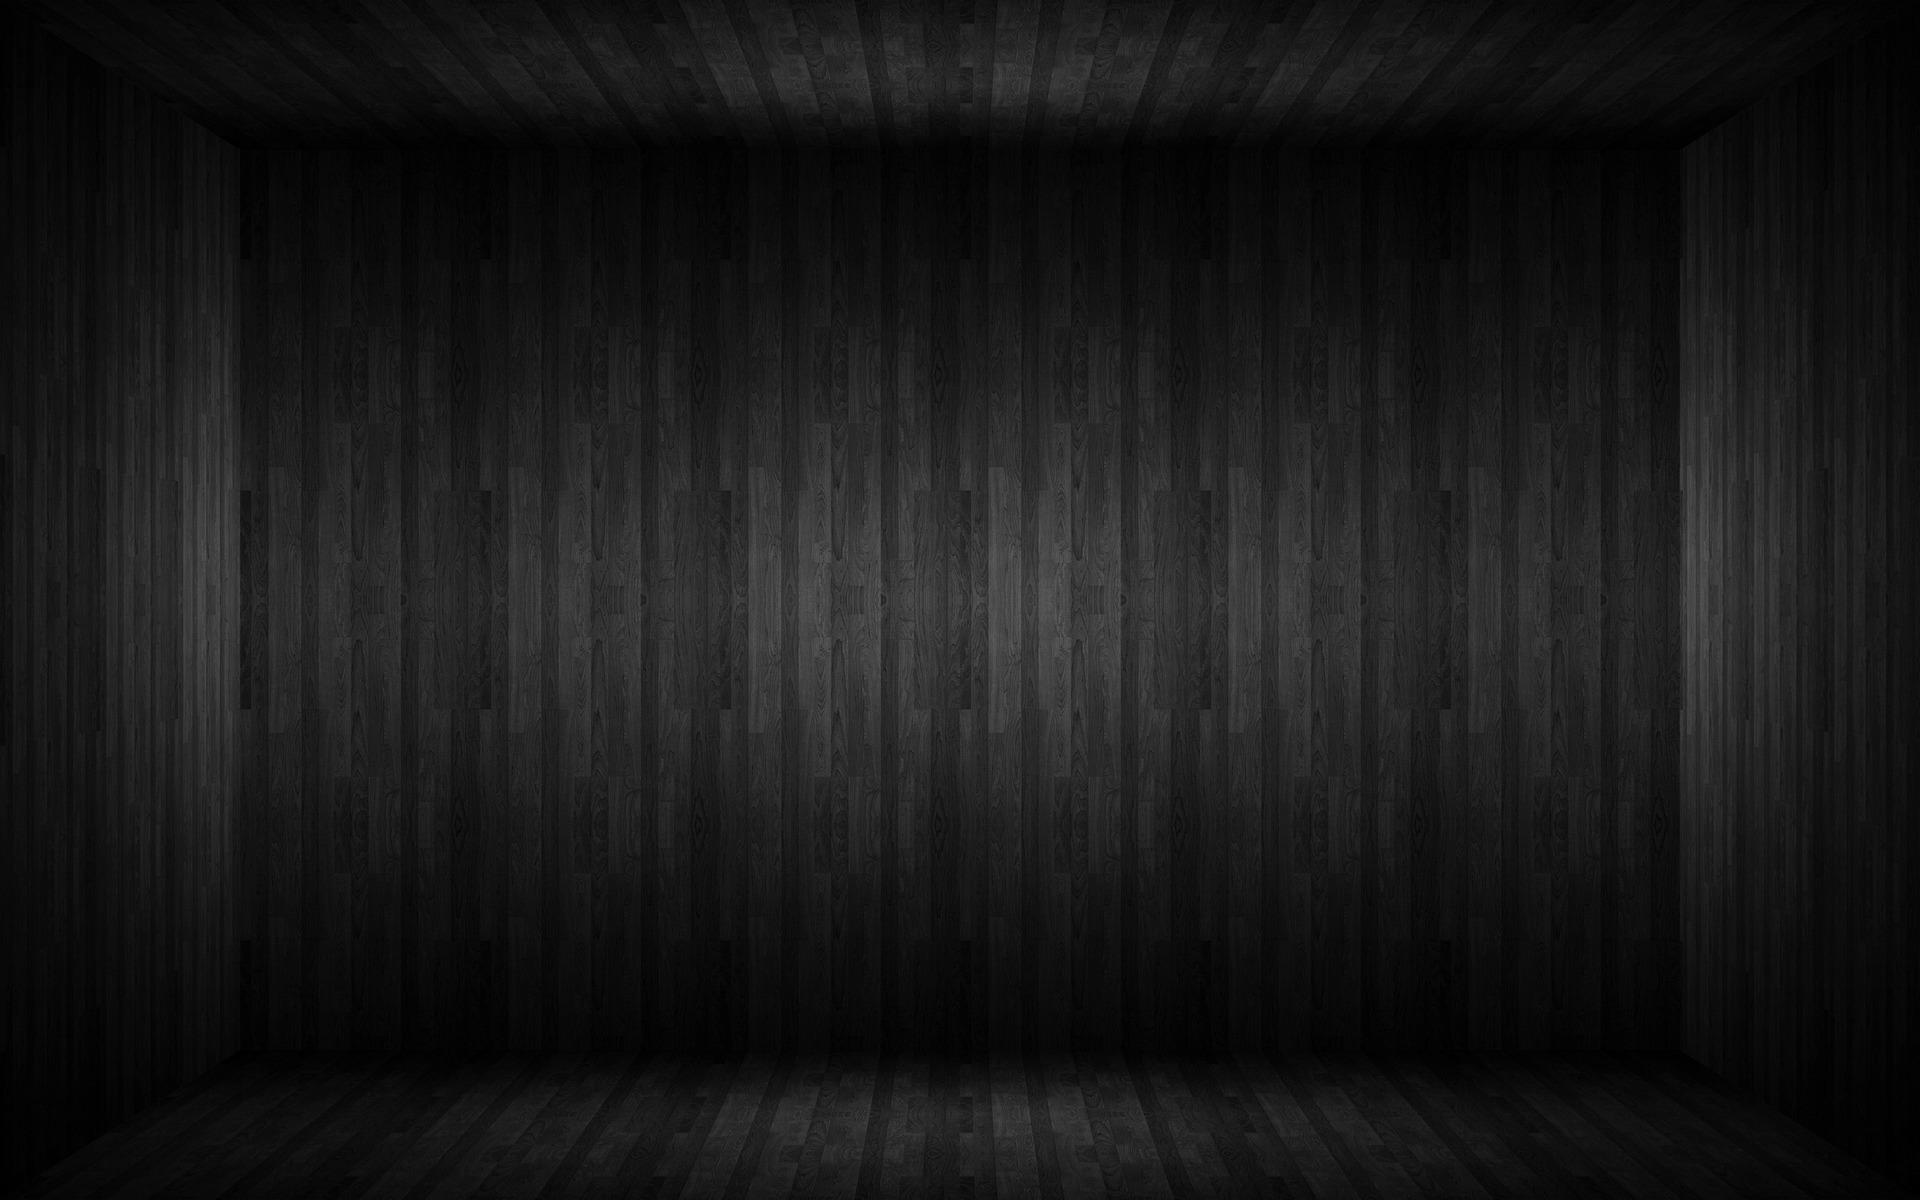 Black Wood Widescreen